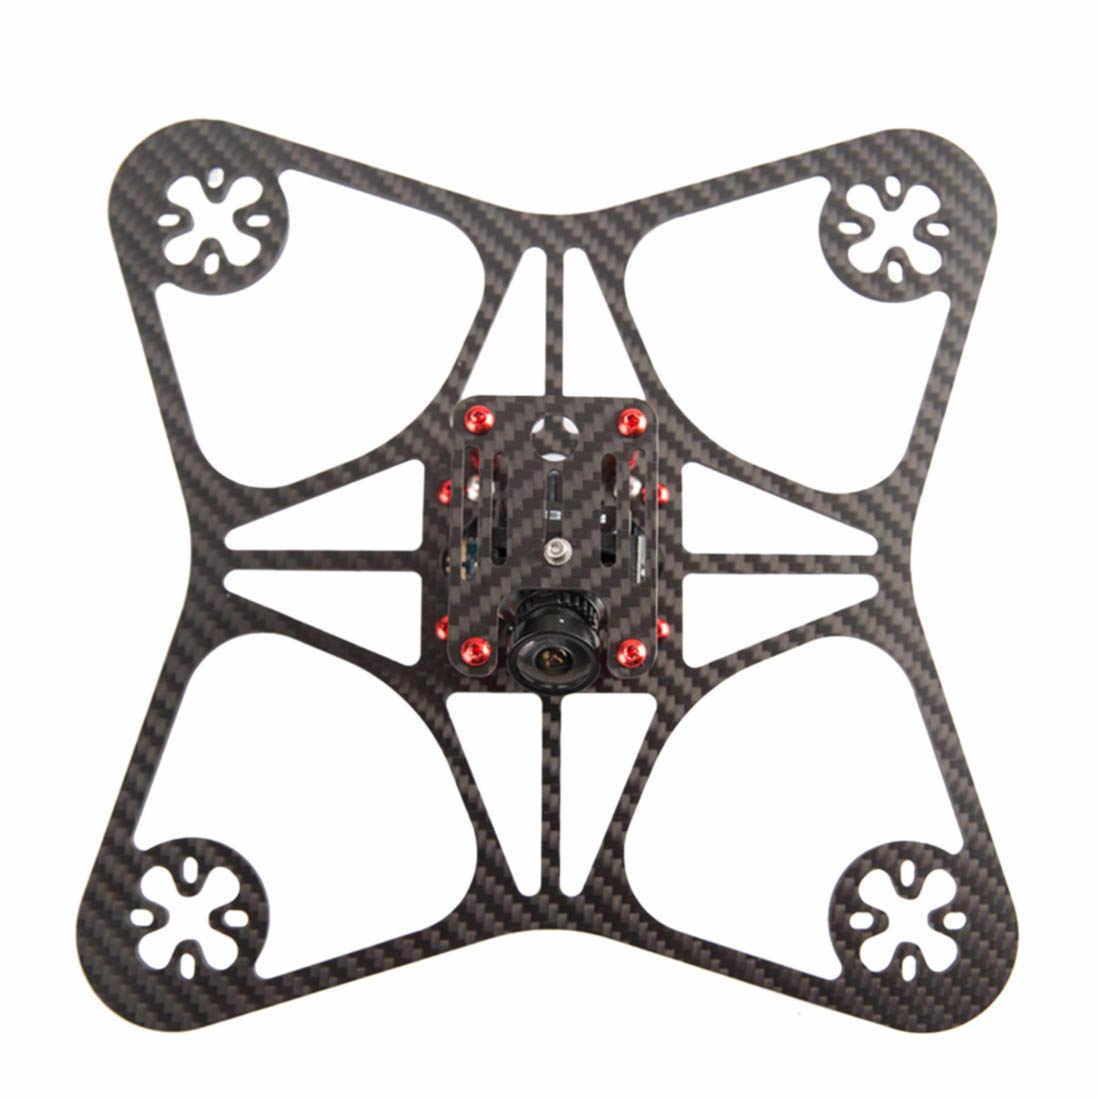 iFlight Broken-resistant Square Base Frame 3K Import Carbon Fiber Body Frame for XS5 FPV Race Quad